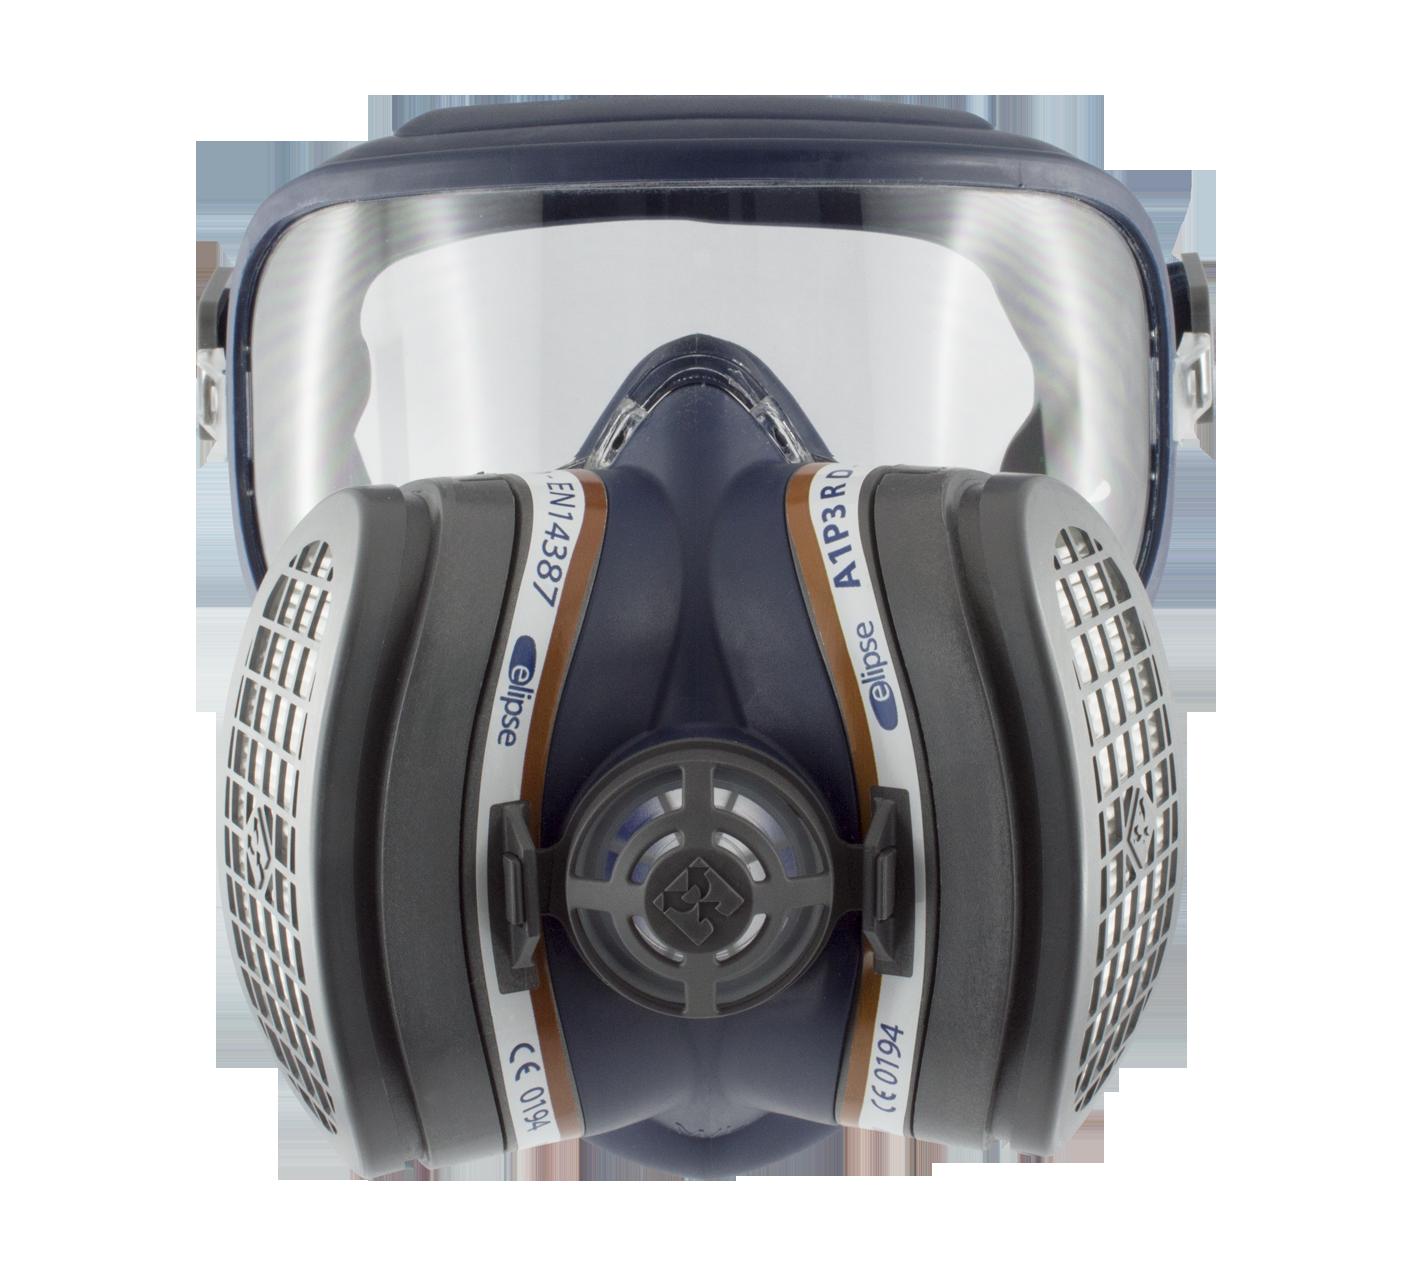 Helmaske GVS Elipse A1-P3 RD